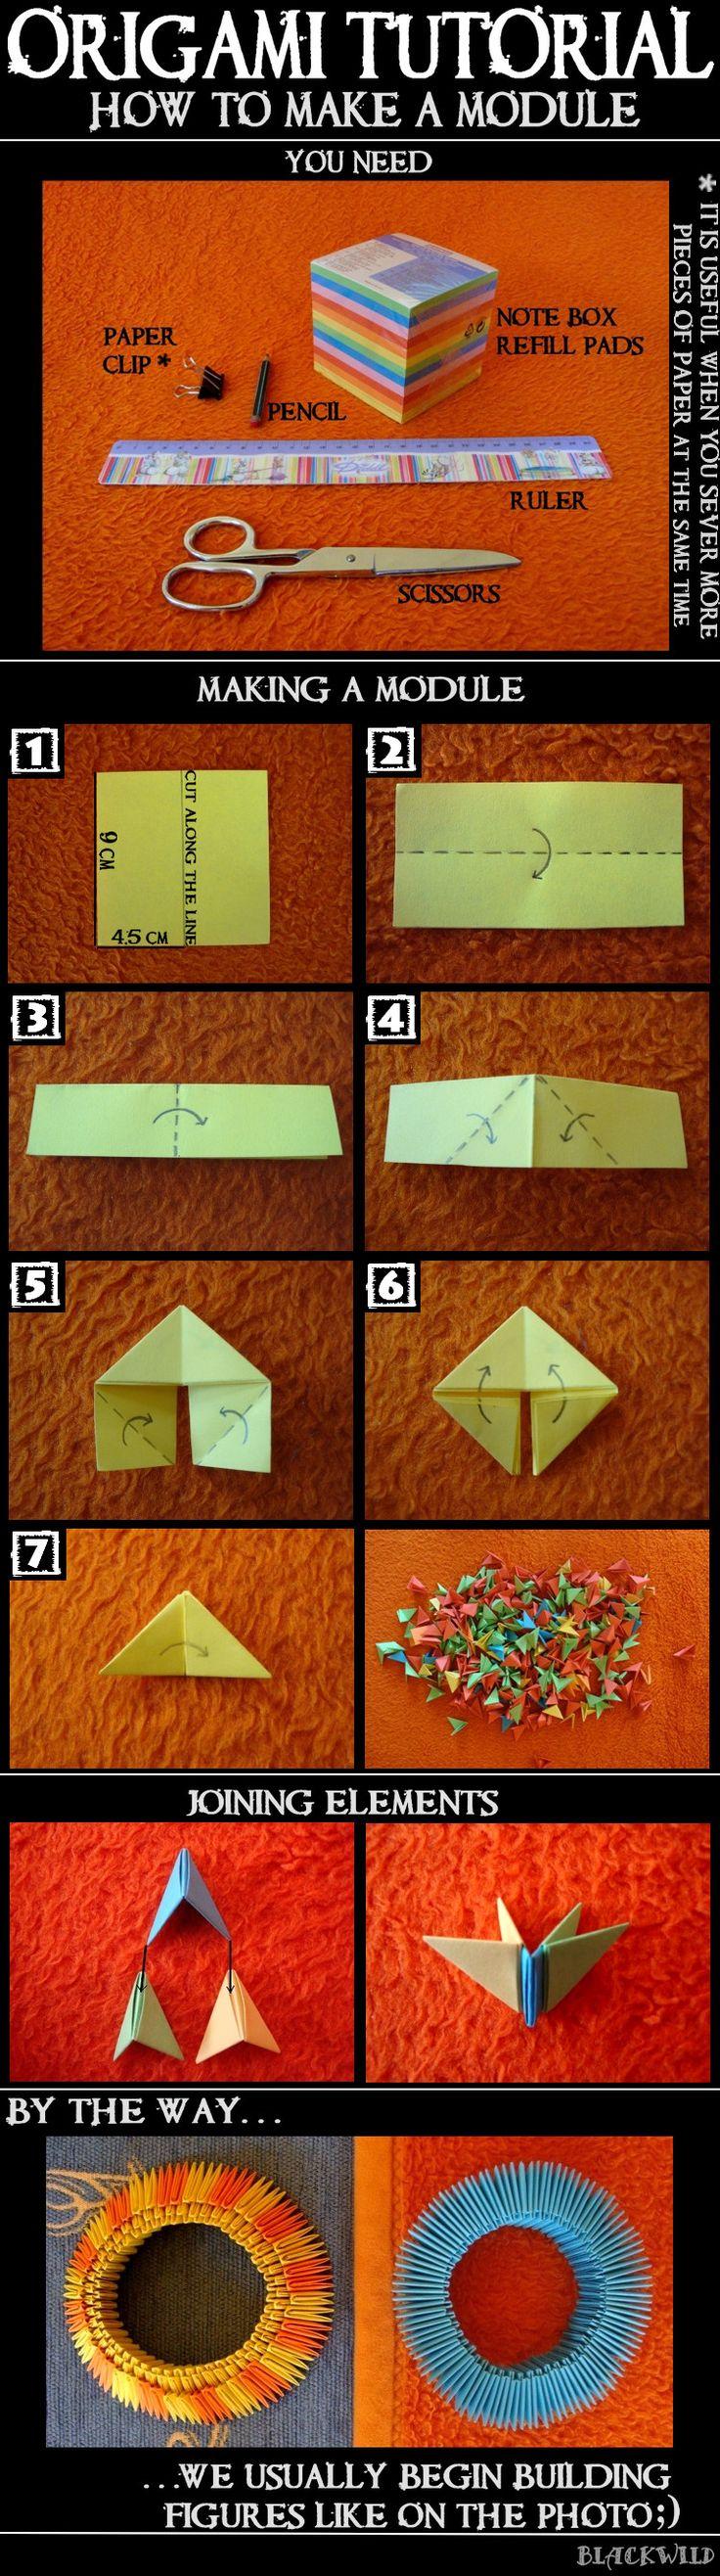 √ Origami Tutorial - Module by ~blackwild on deviantART.